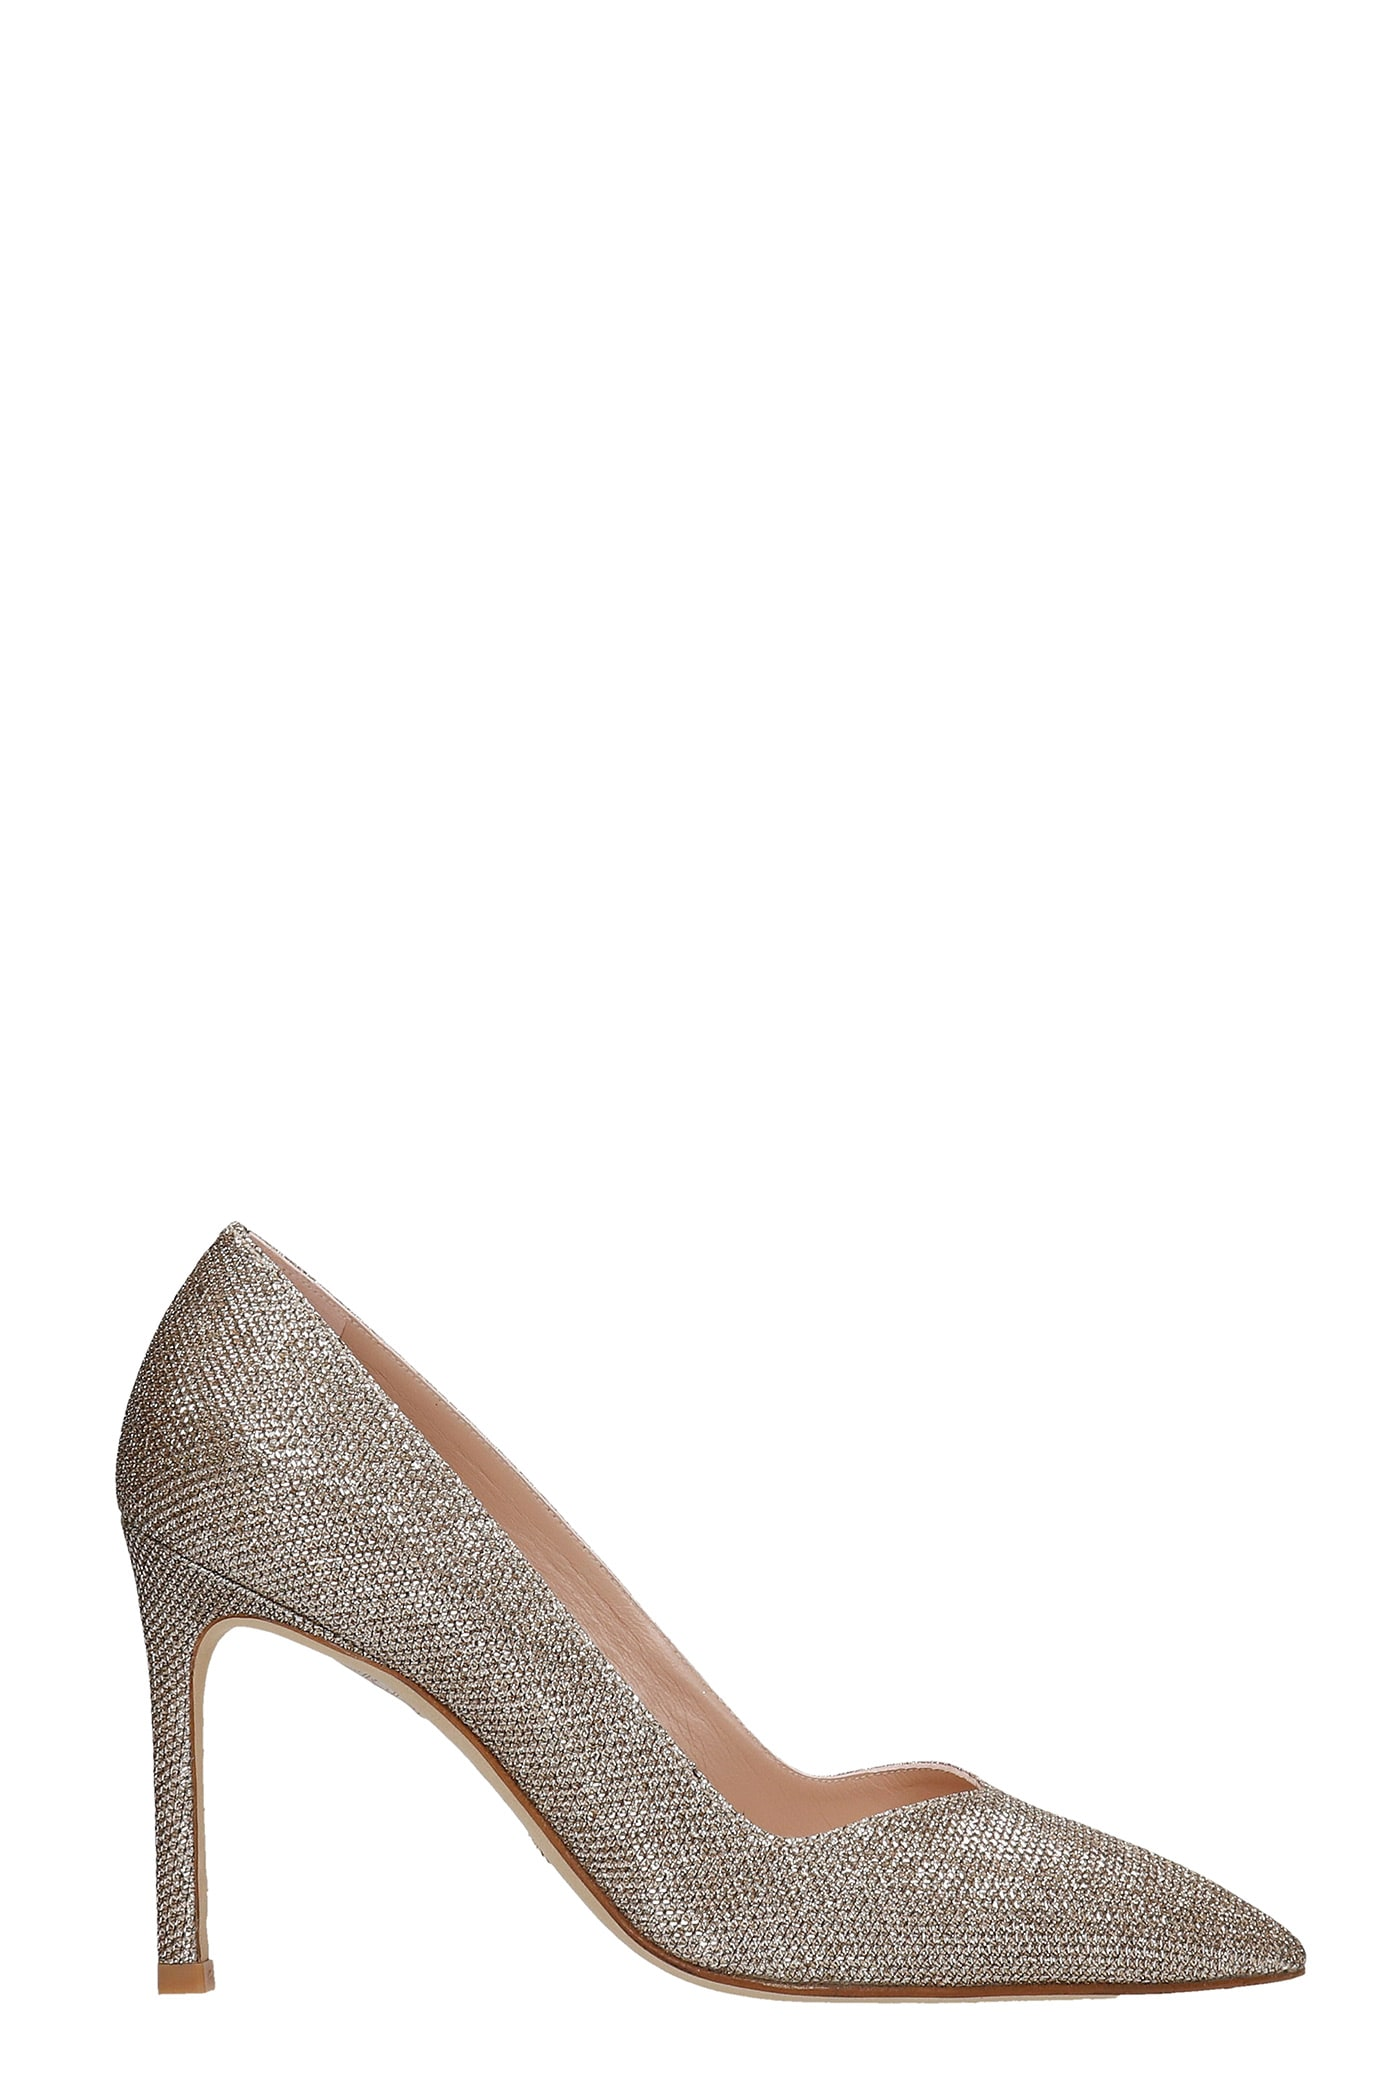 Buy Stuart Weitzman Anny Pumps In Platinum Glitter online, shop Stuart Weitzman shoes with free shipping